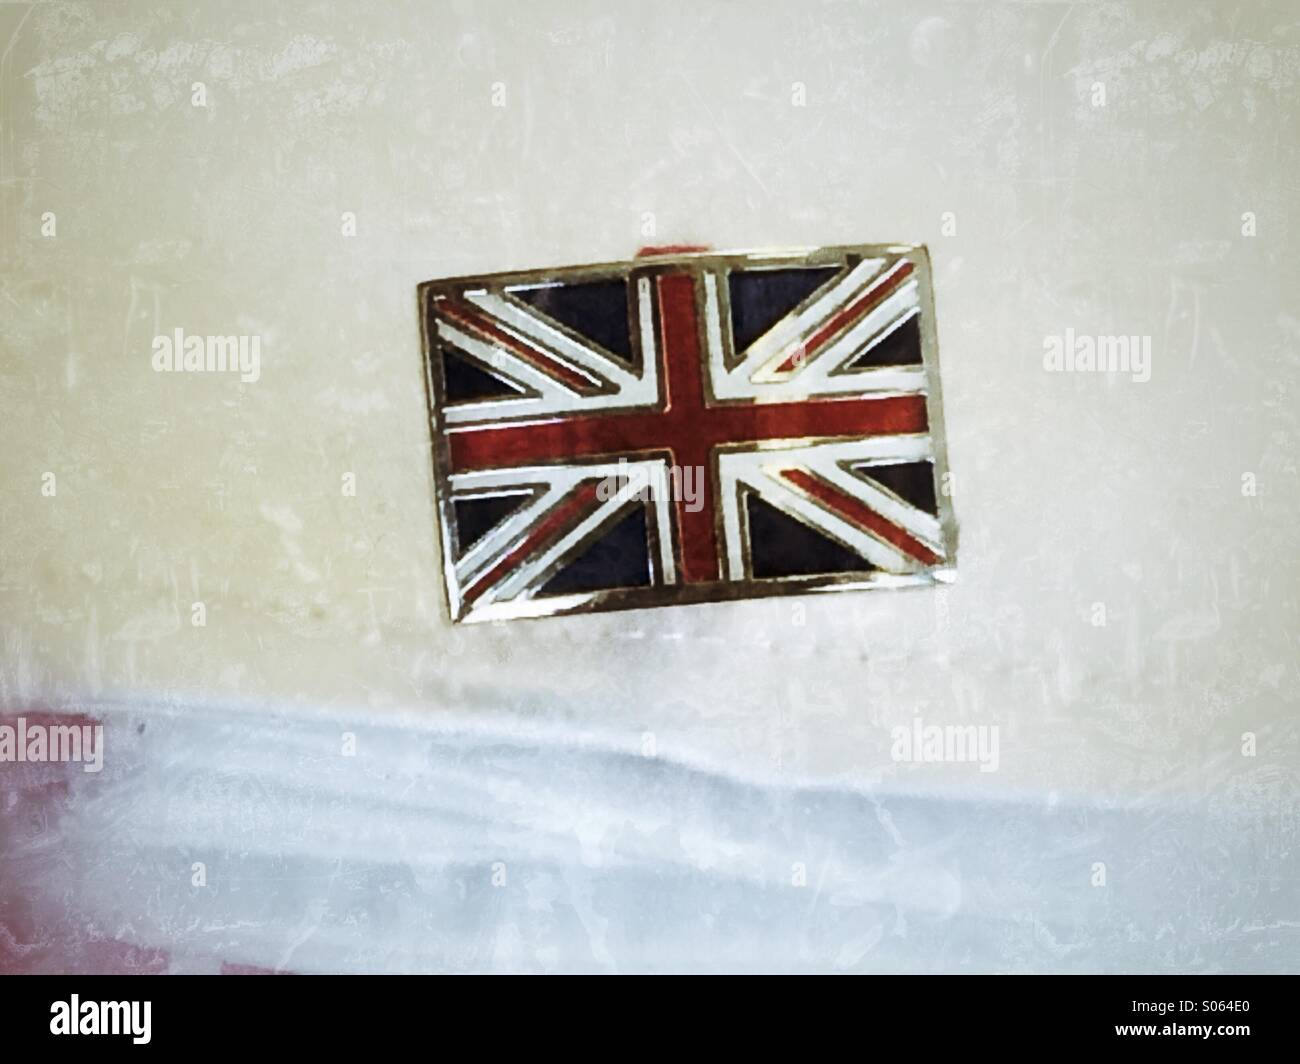 Union Jack cuff link - Stock Image